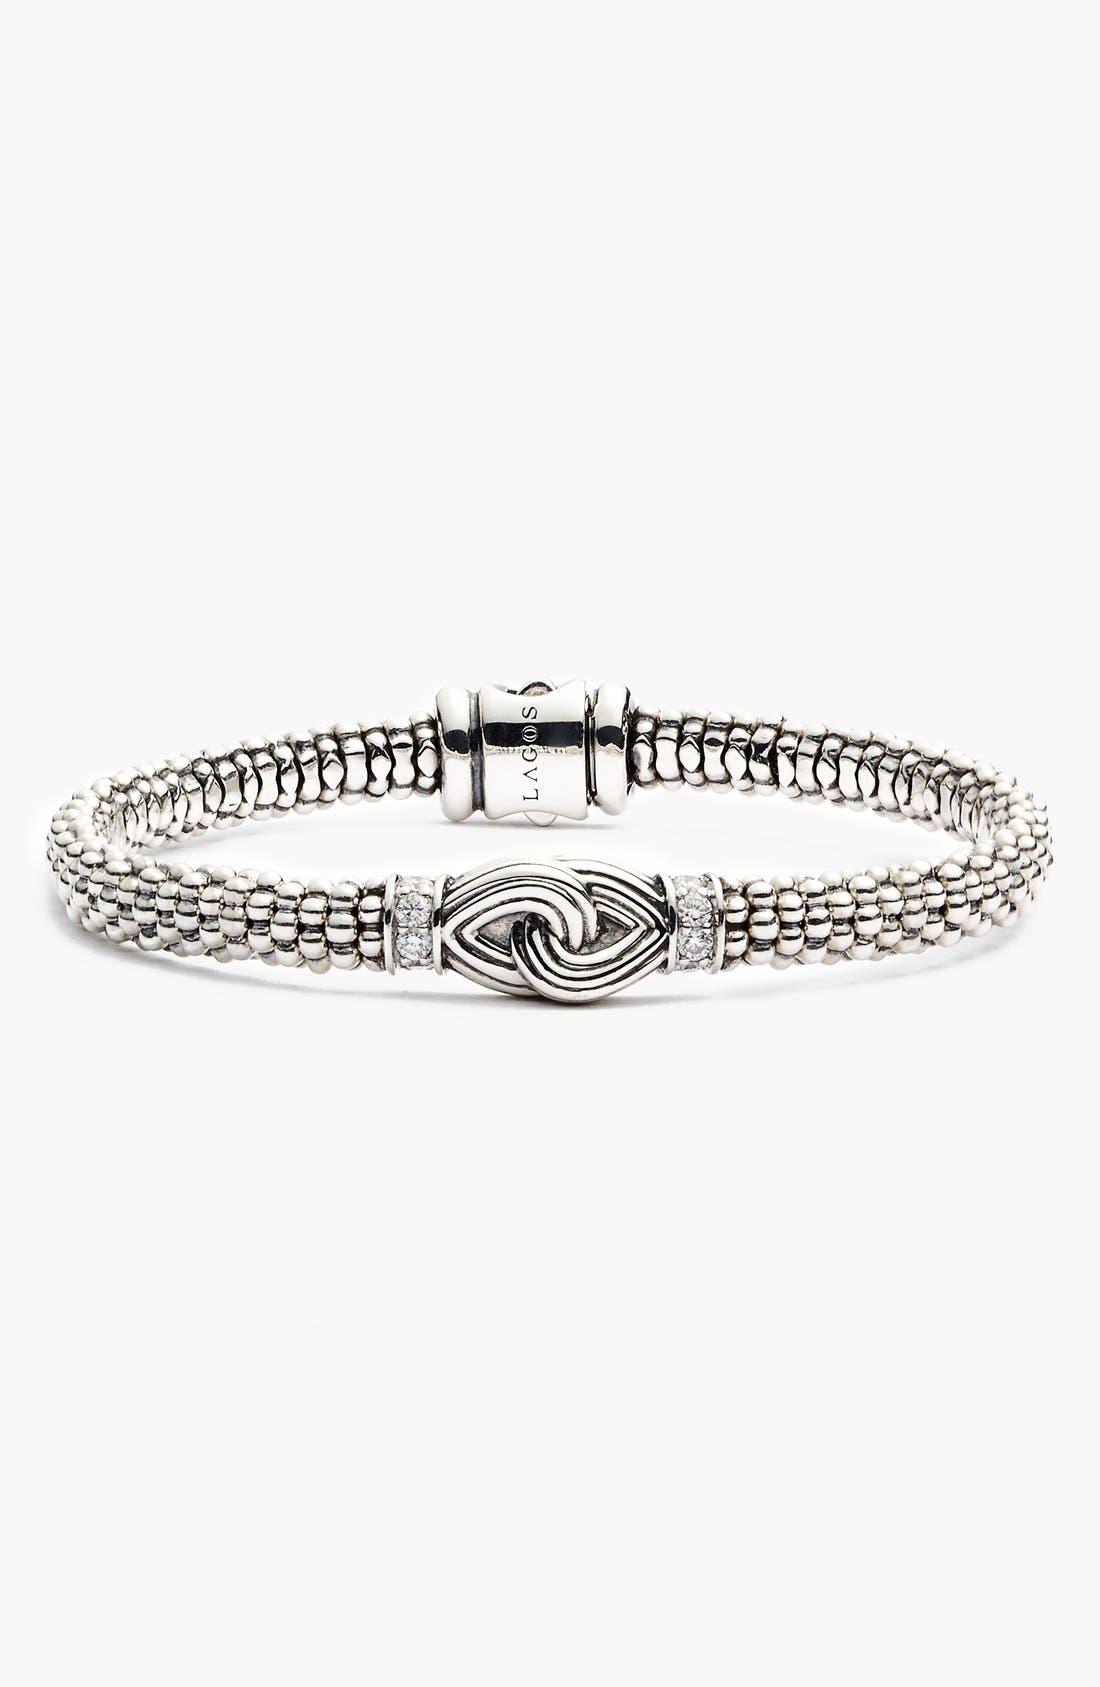 Main Image - LAGOS 'Silver Knot' Diamond & Caviar Station Bracelet (Nordstrom Online Exclusive)